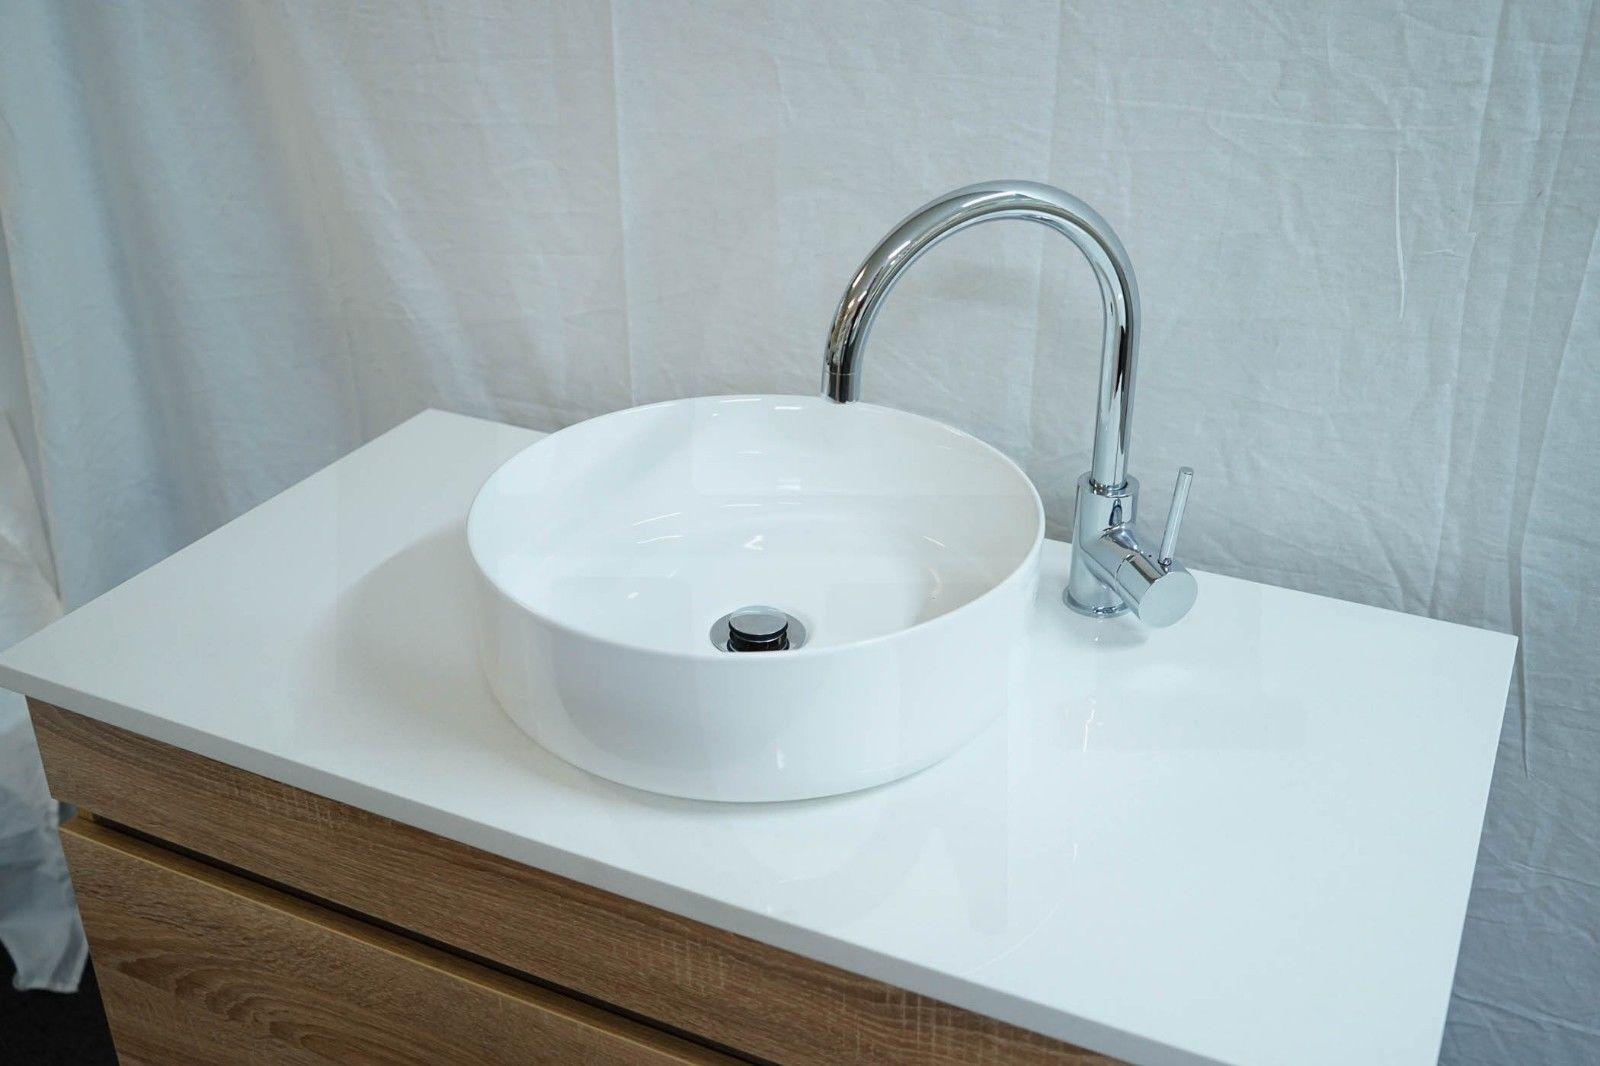 8a eve round circular gloss white ceramic above counter art basin